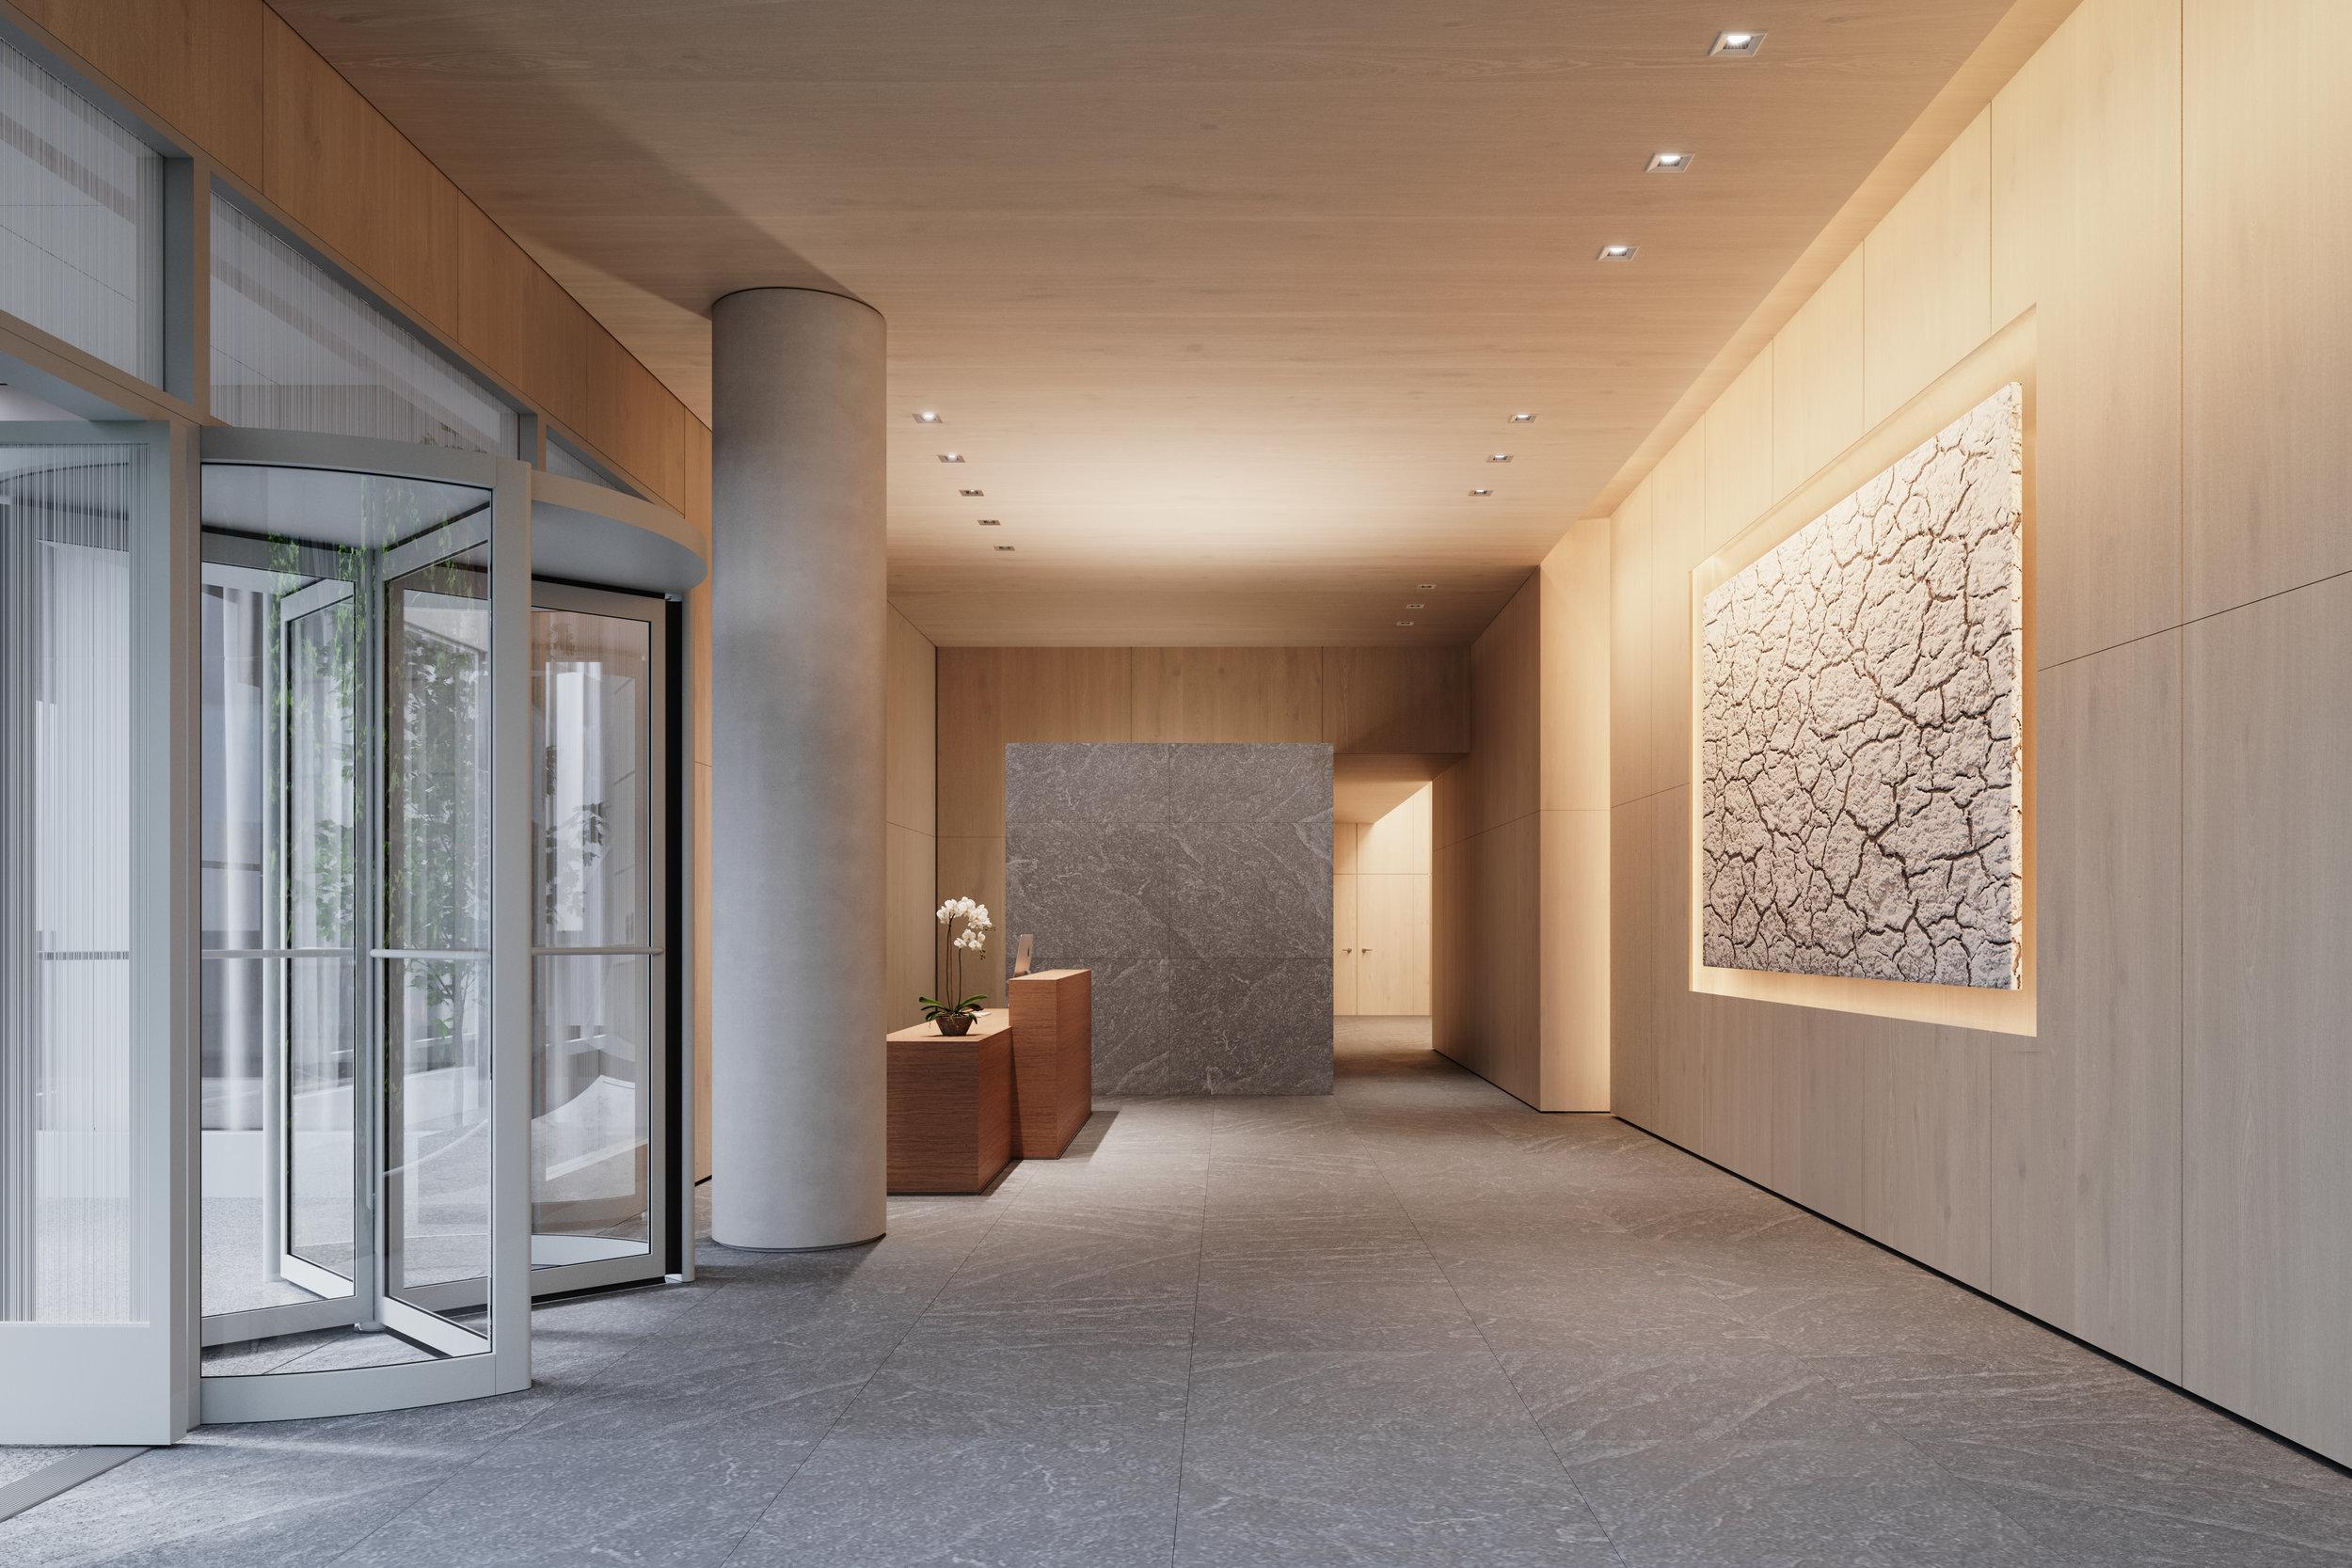 INT01_Lobby Interior_E7A.jpg